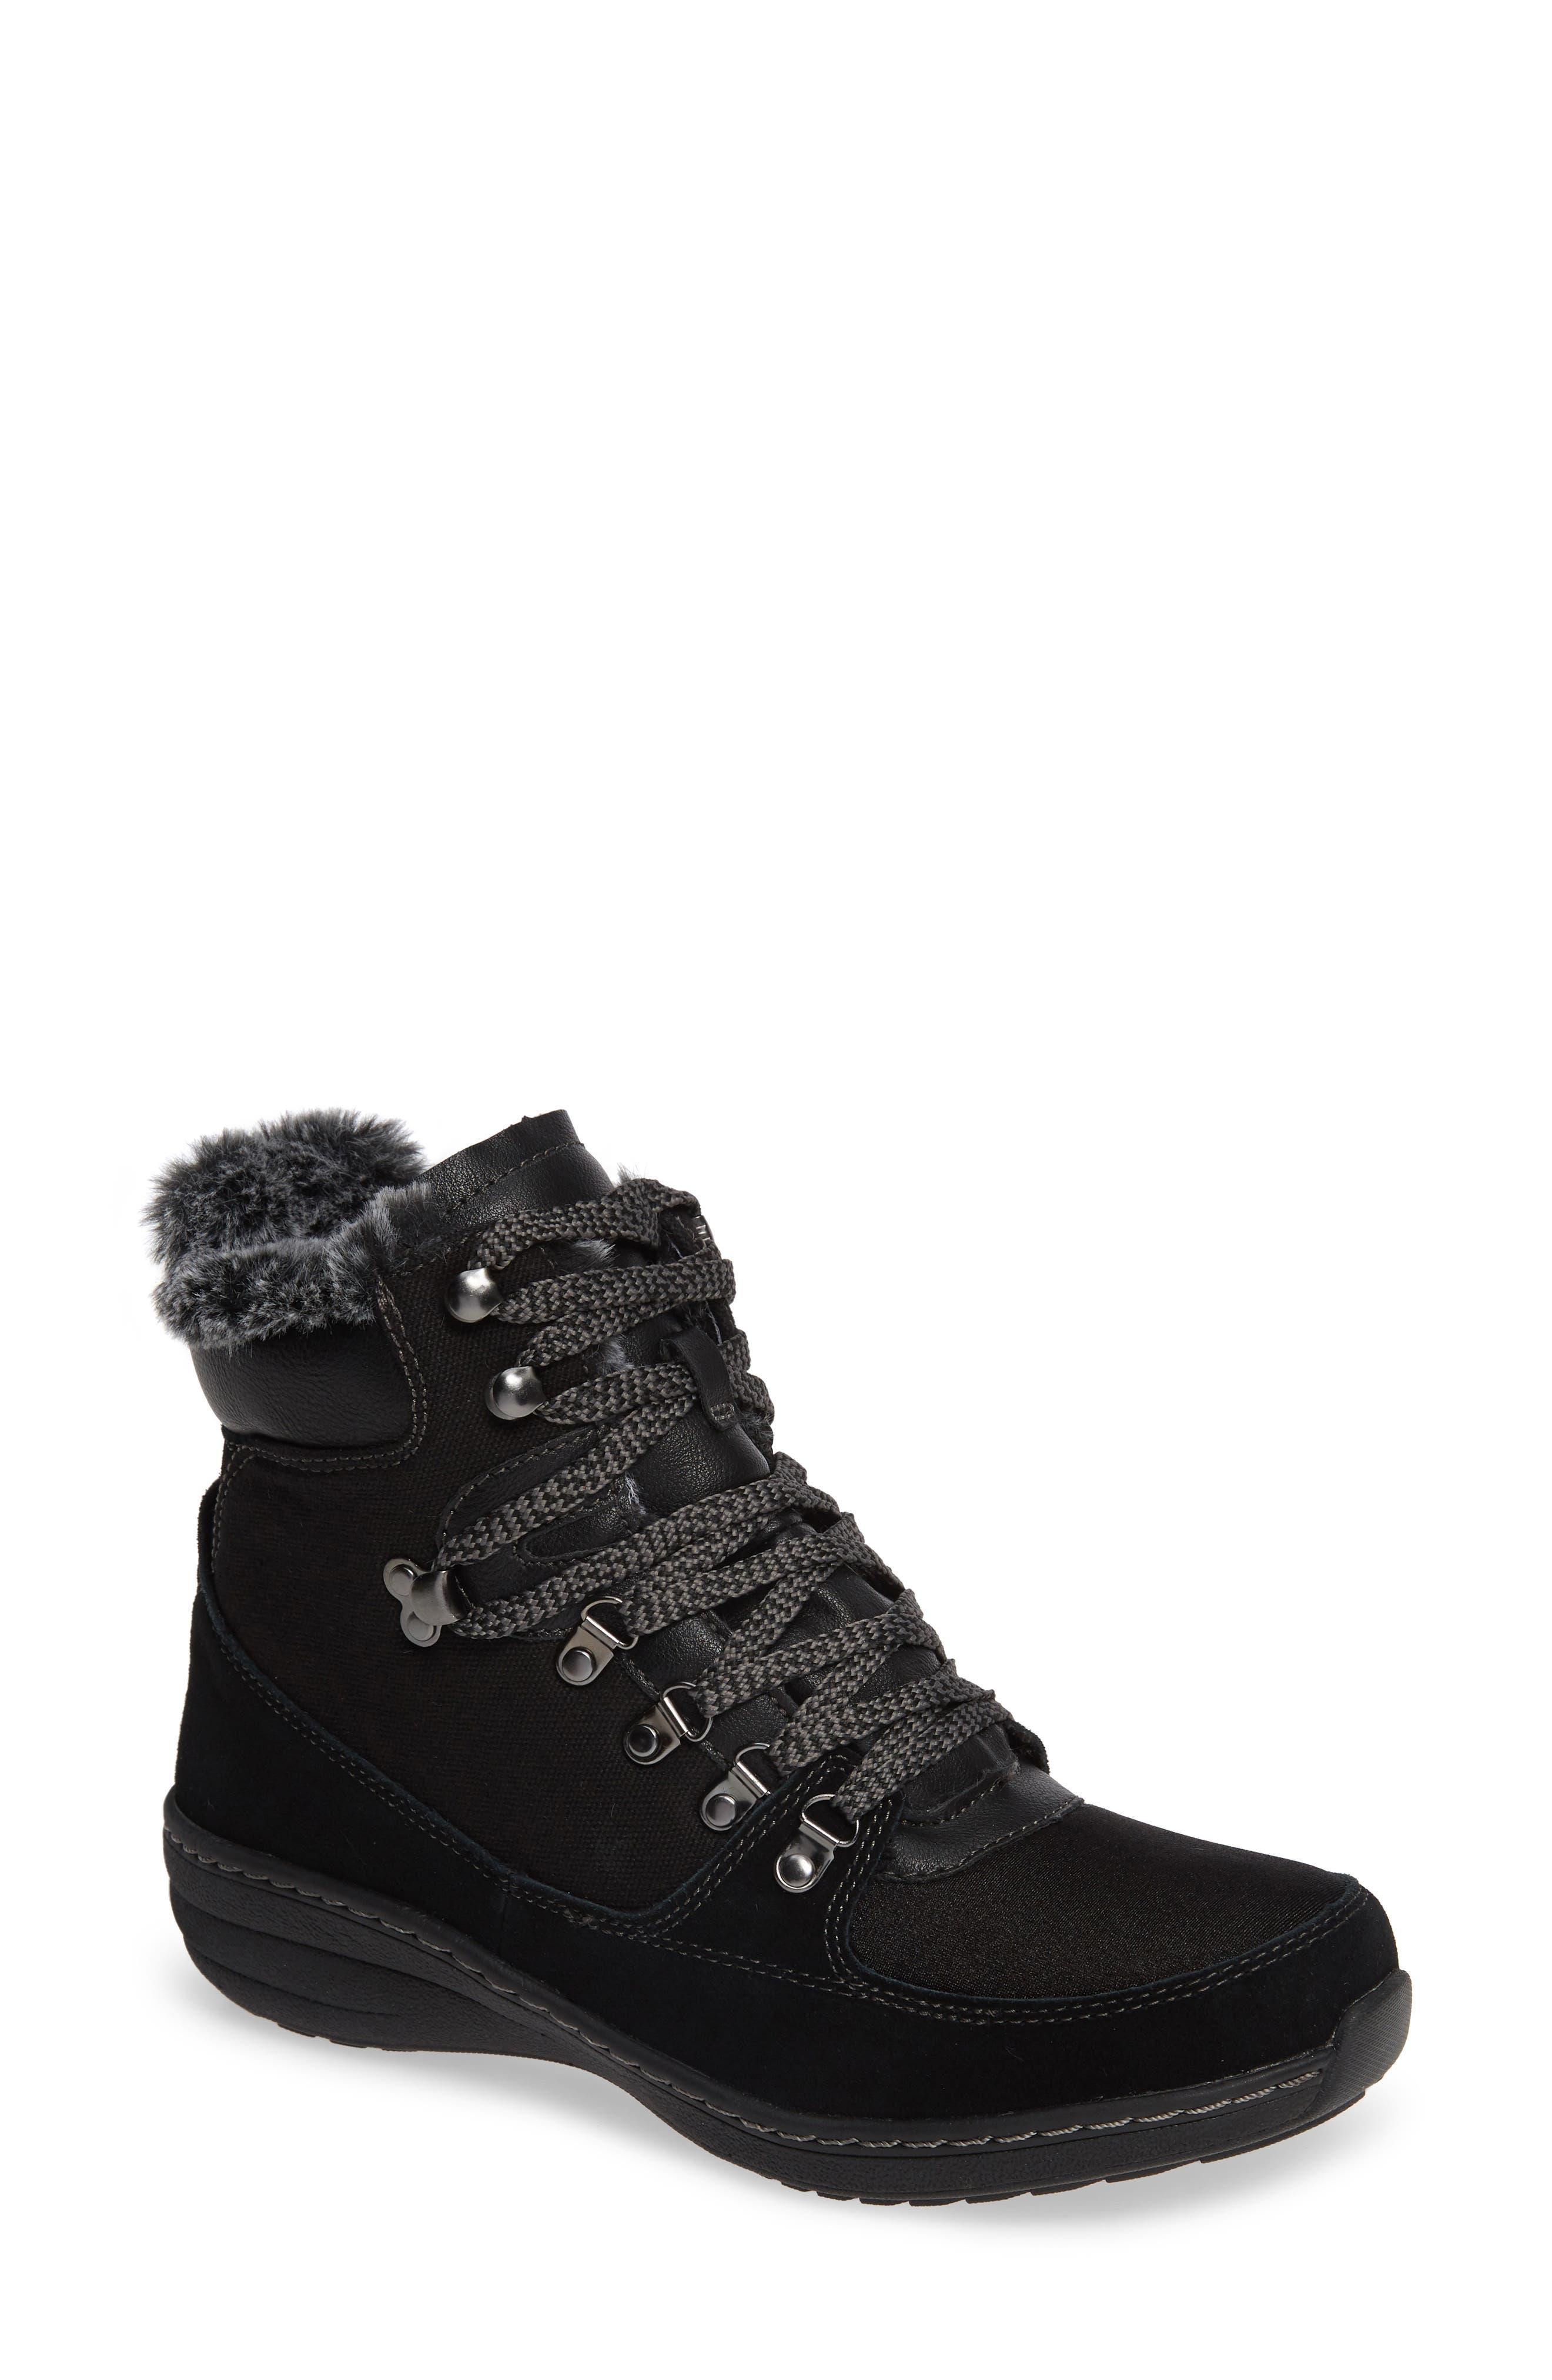 Aetrex Kelsey Faux Fur Lined Hiker Boot - Black